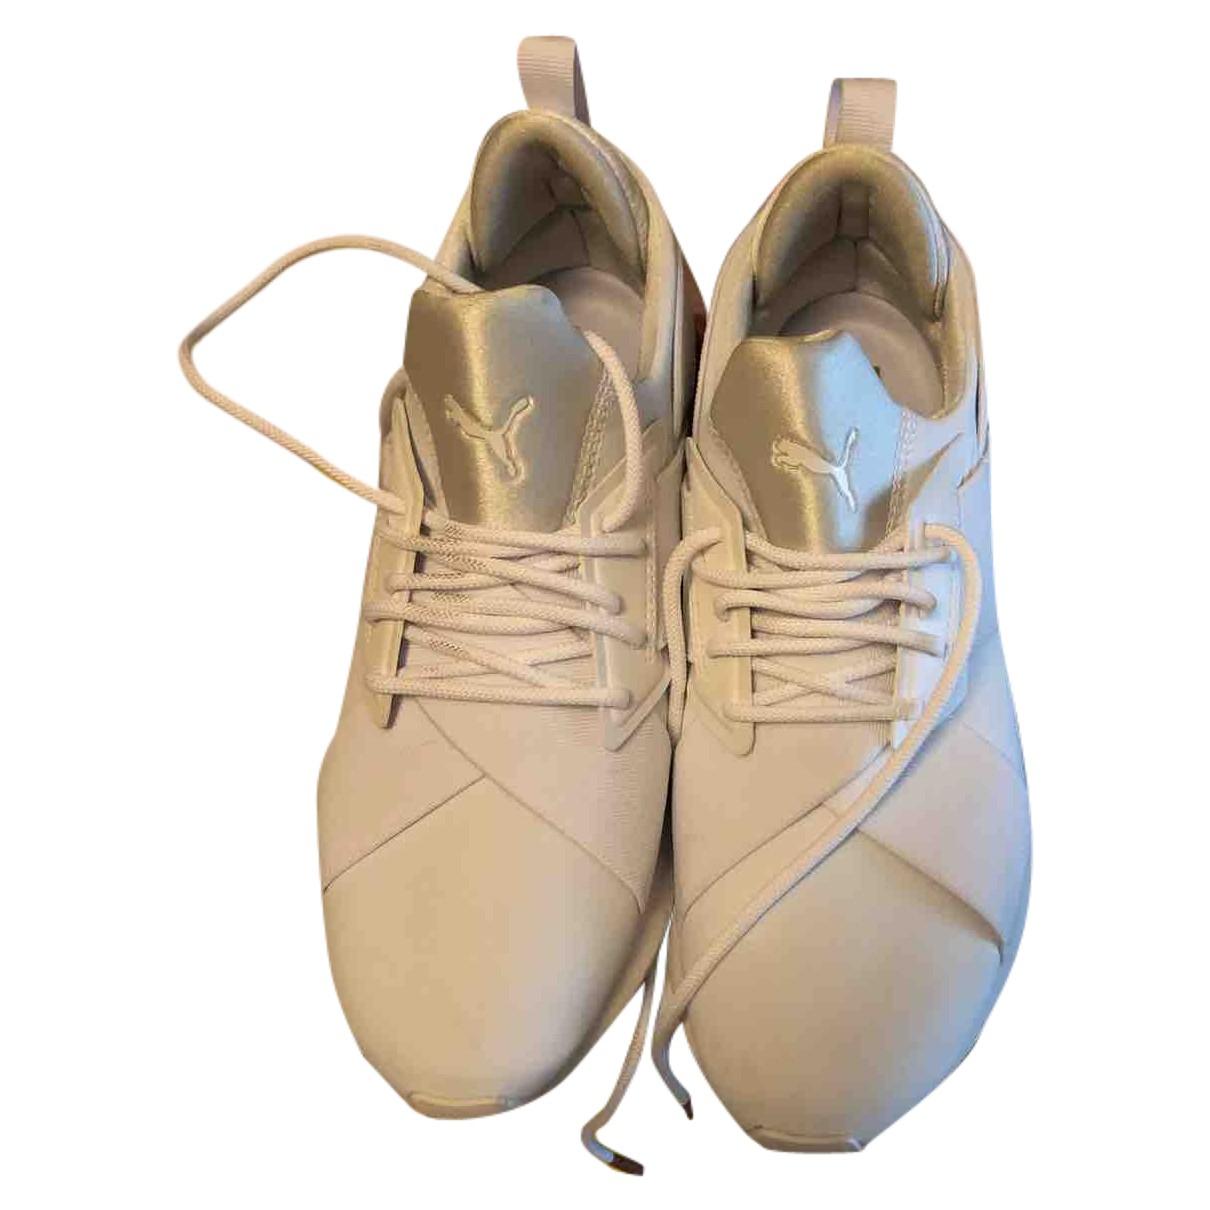 Puma N White Cloth Trainers for Women 38.5 EU